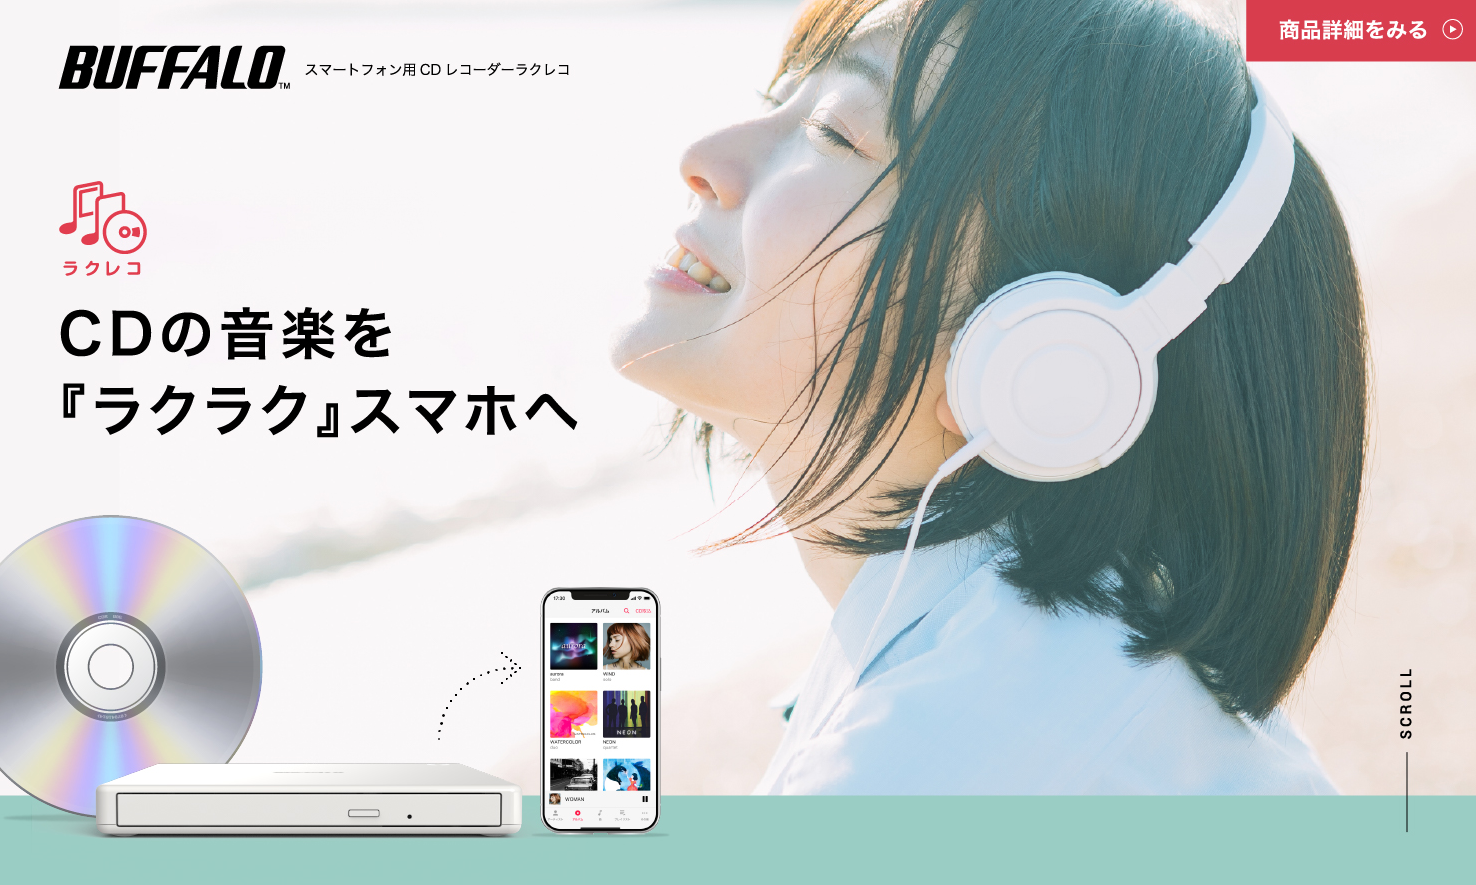 CDの音楽を手軽にスマホへ取り込めるCDレコーダー「ラクレコ」アプリが「歌詞追従表示」機能に対応